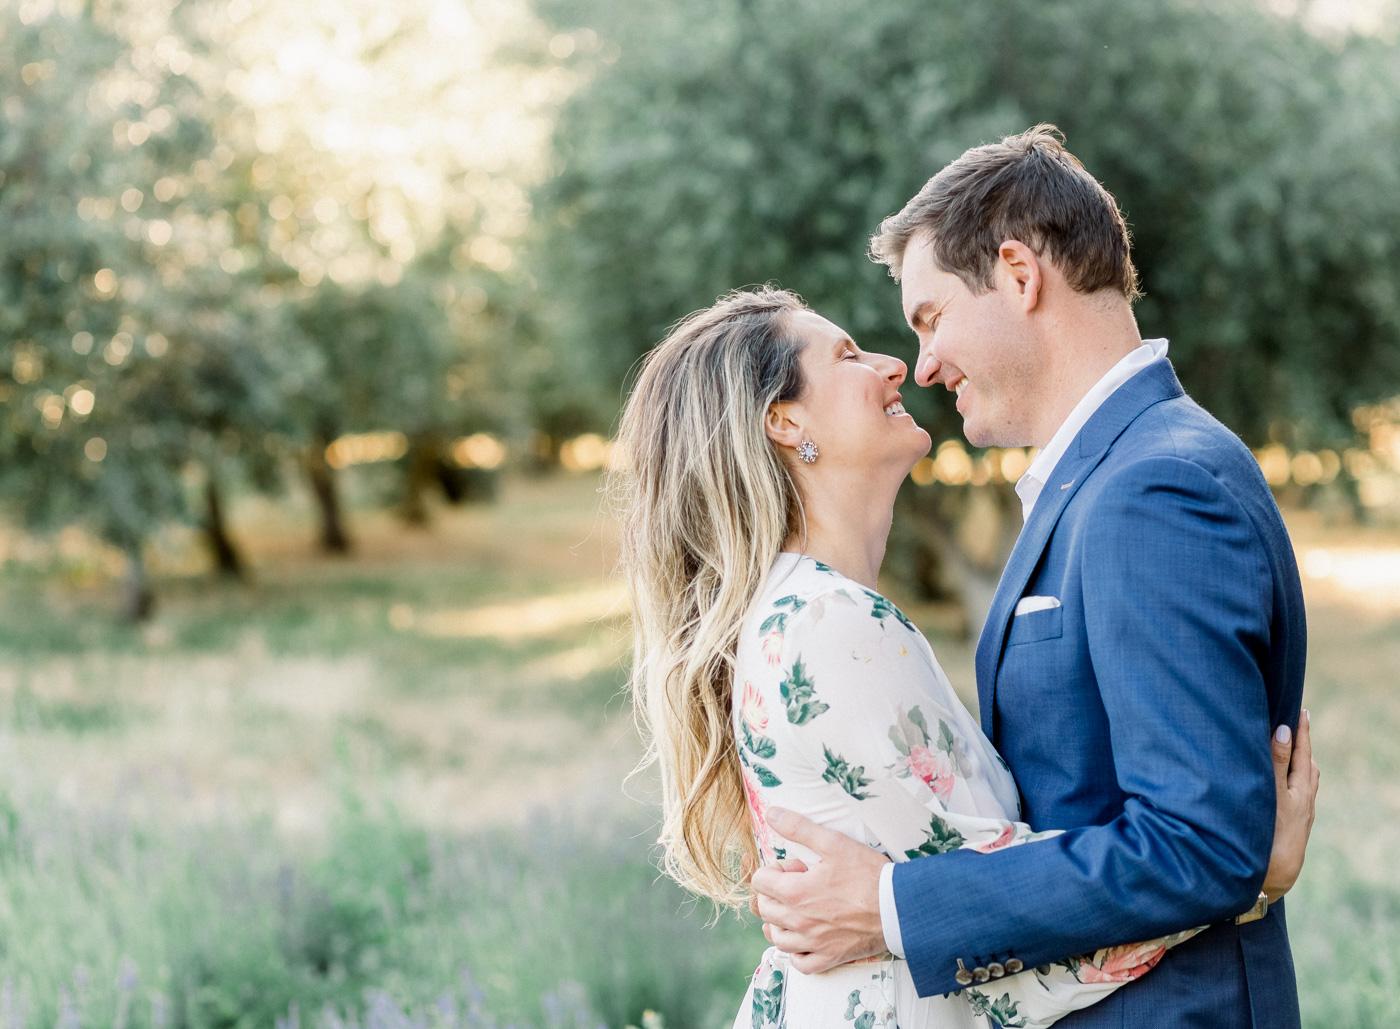 Adorn Life Lake Tahoe Wedding Photographer IMG_9556-Edit.jpg